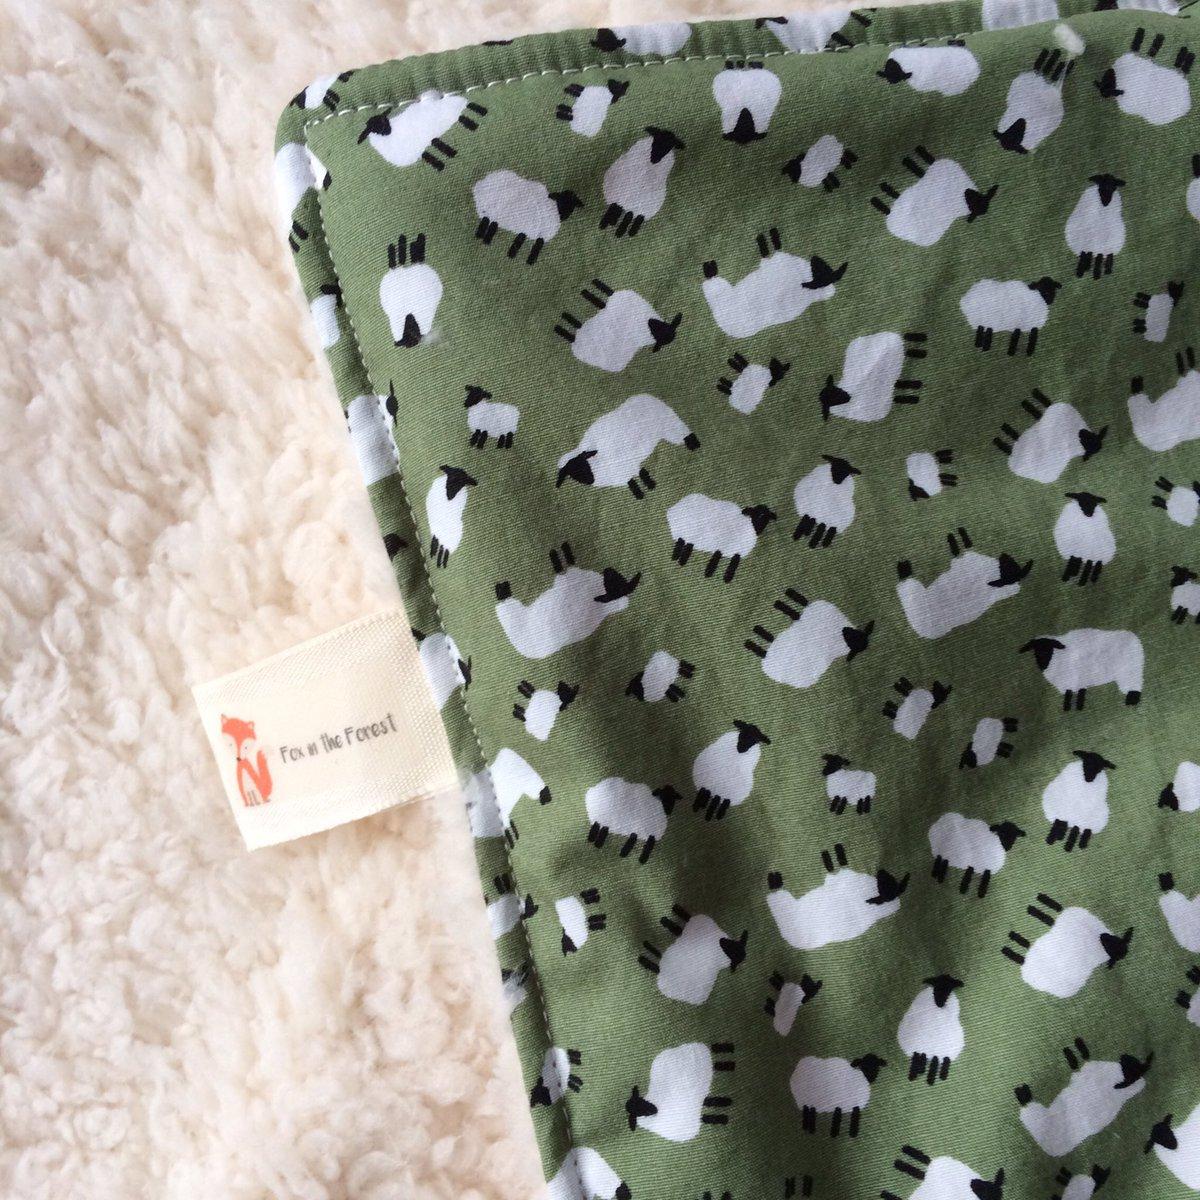 Another new #blanket for my shop in this cute little sheep pattern!  #etsy #babyblanket #baby    https://www. etsy.com/uk/listing/512 824807/sheep-babychildrens-blanket-childrens &nbsp; … <br>http://pic.twitter.com/jHDmHwexdu